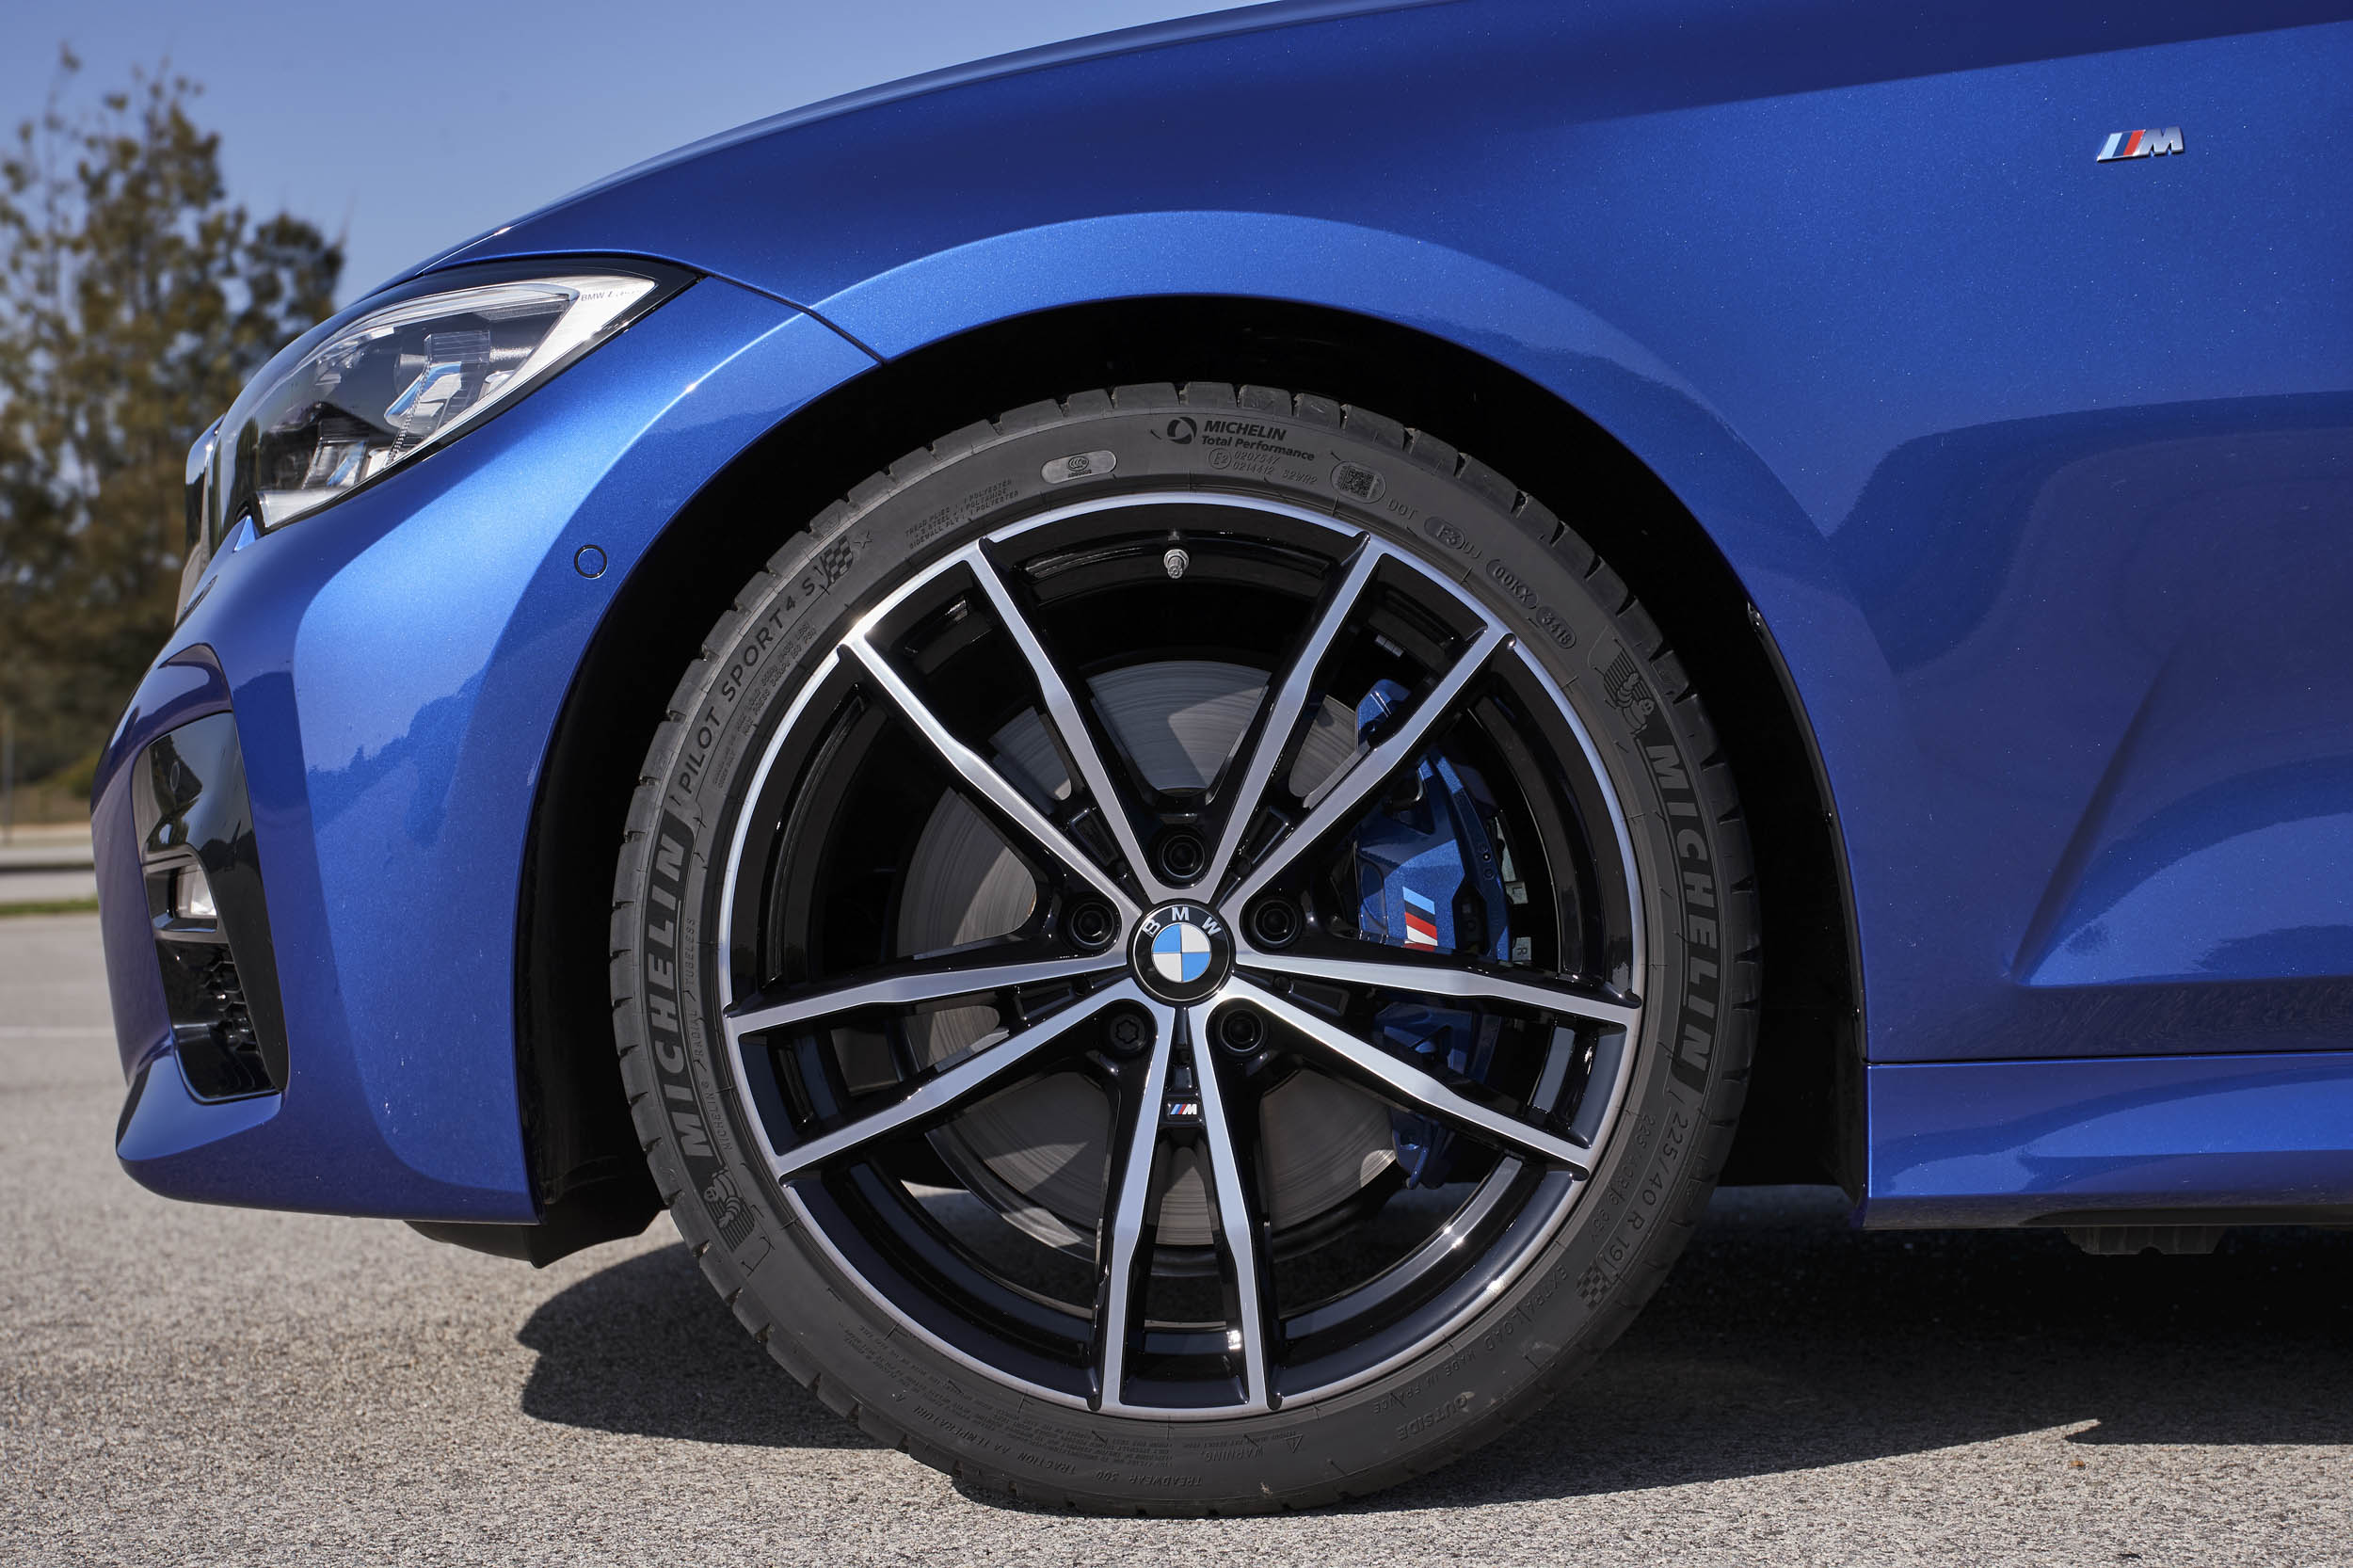 2019 BMW 330i M Sport wheel detail